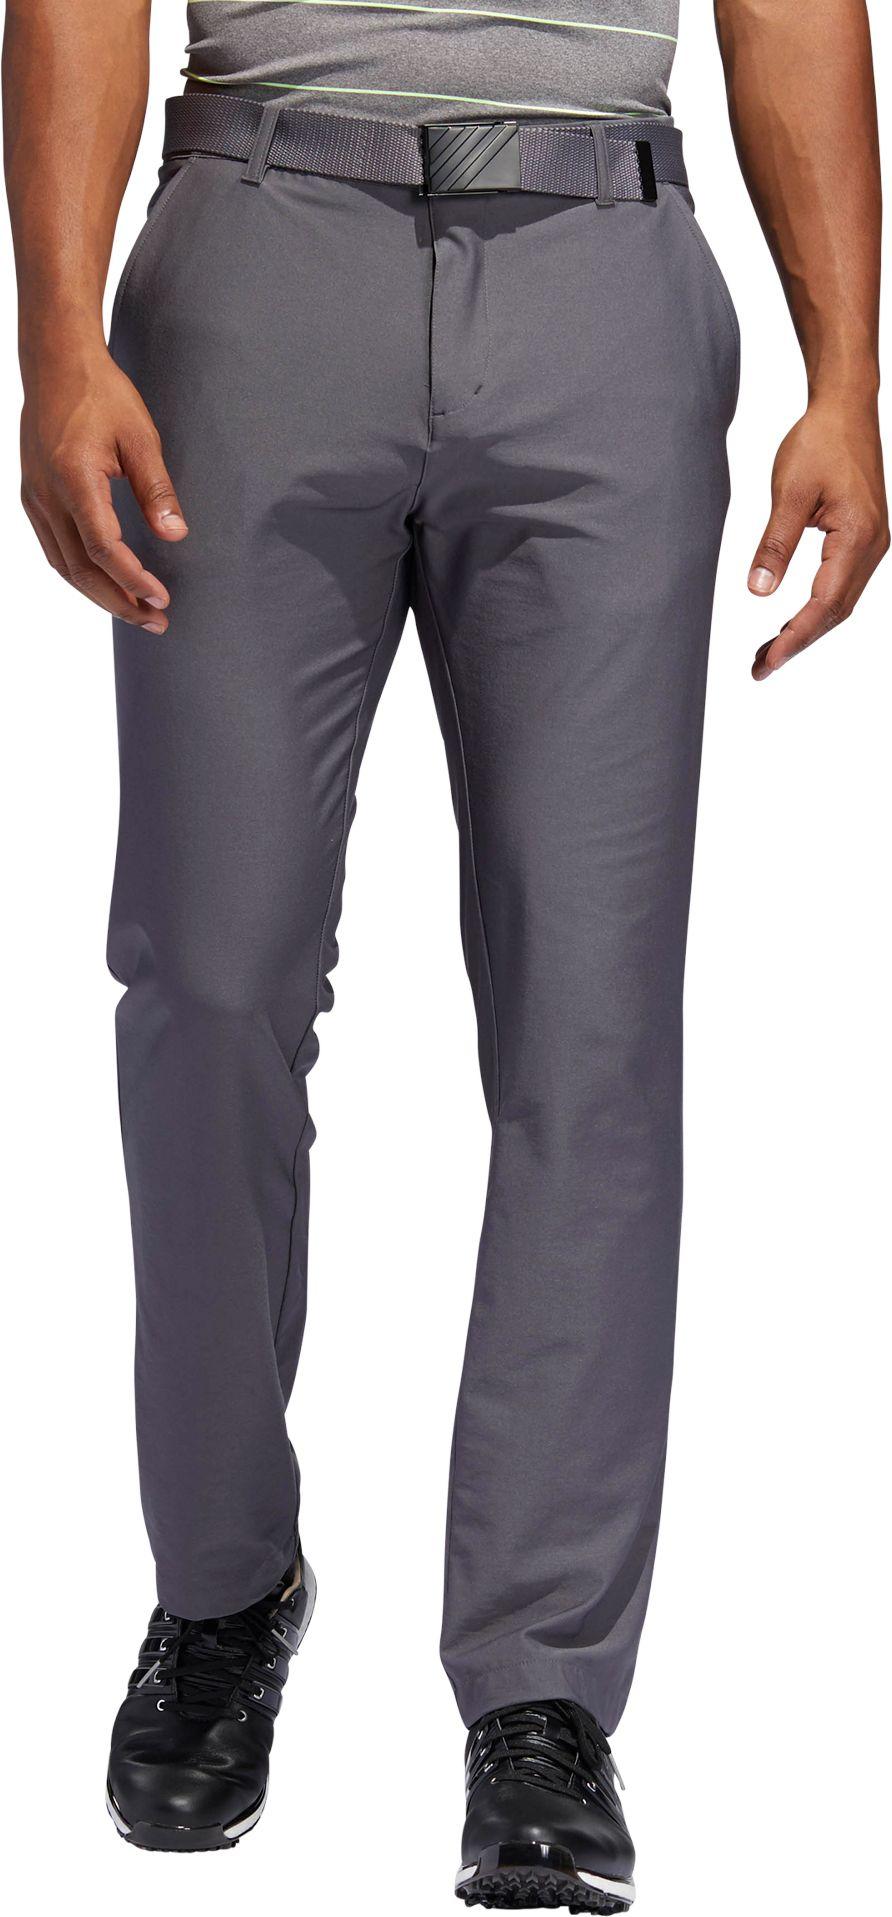 adidas lightweight 5 pocket golf trousers